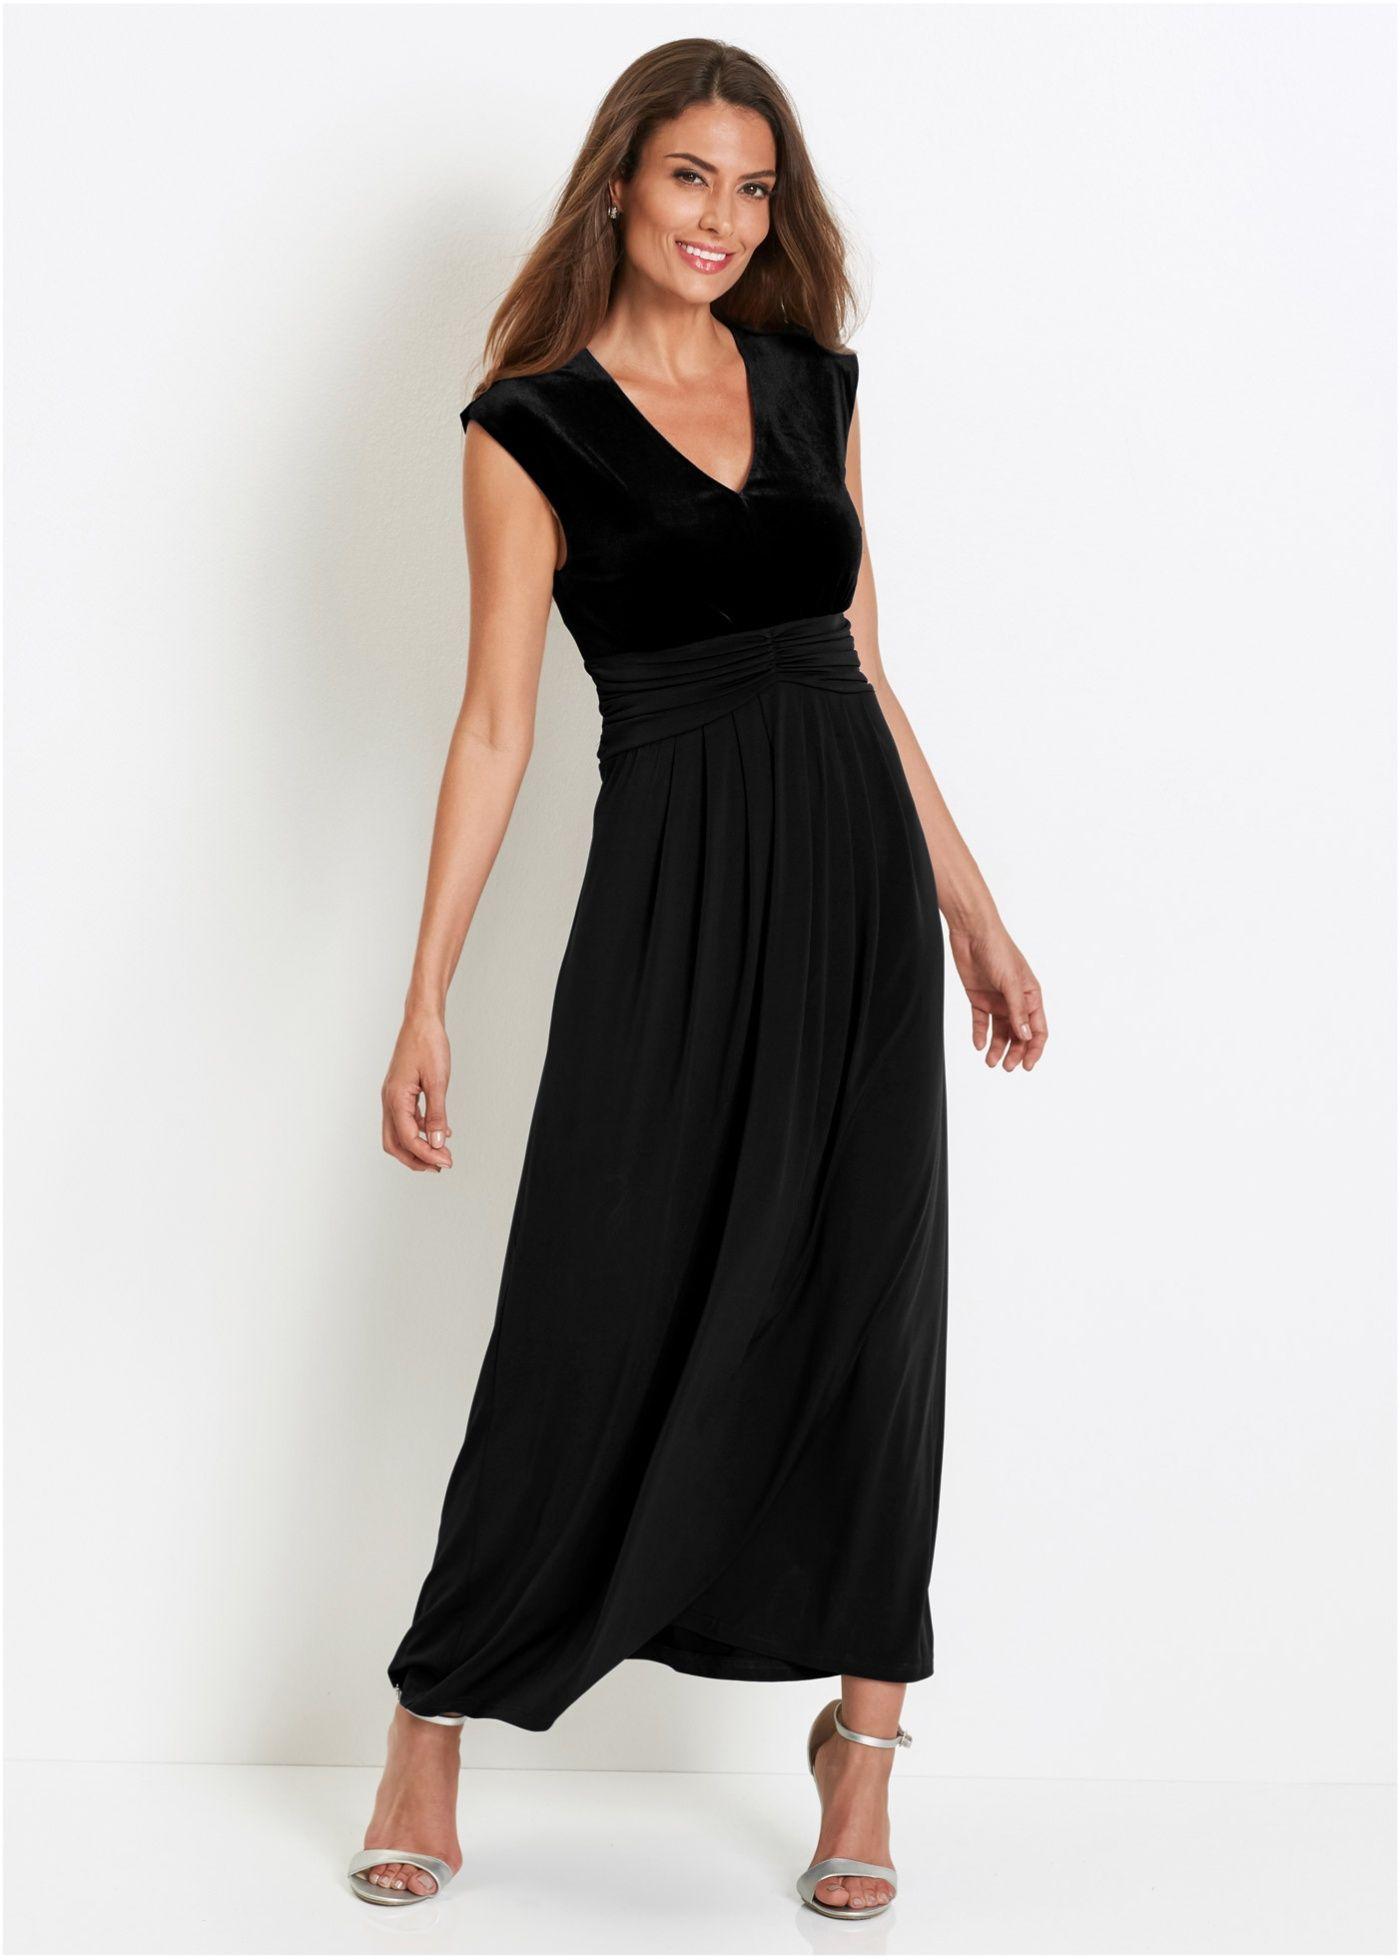 Avondjurk, bpc selection premium  Avondjurk, Lange jurken, Mode